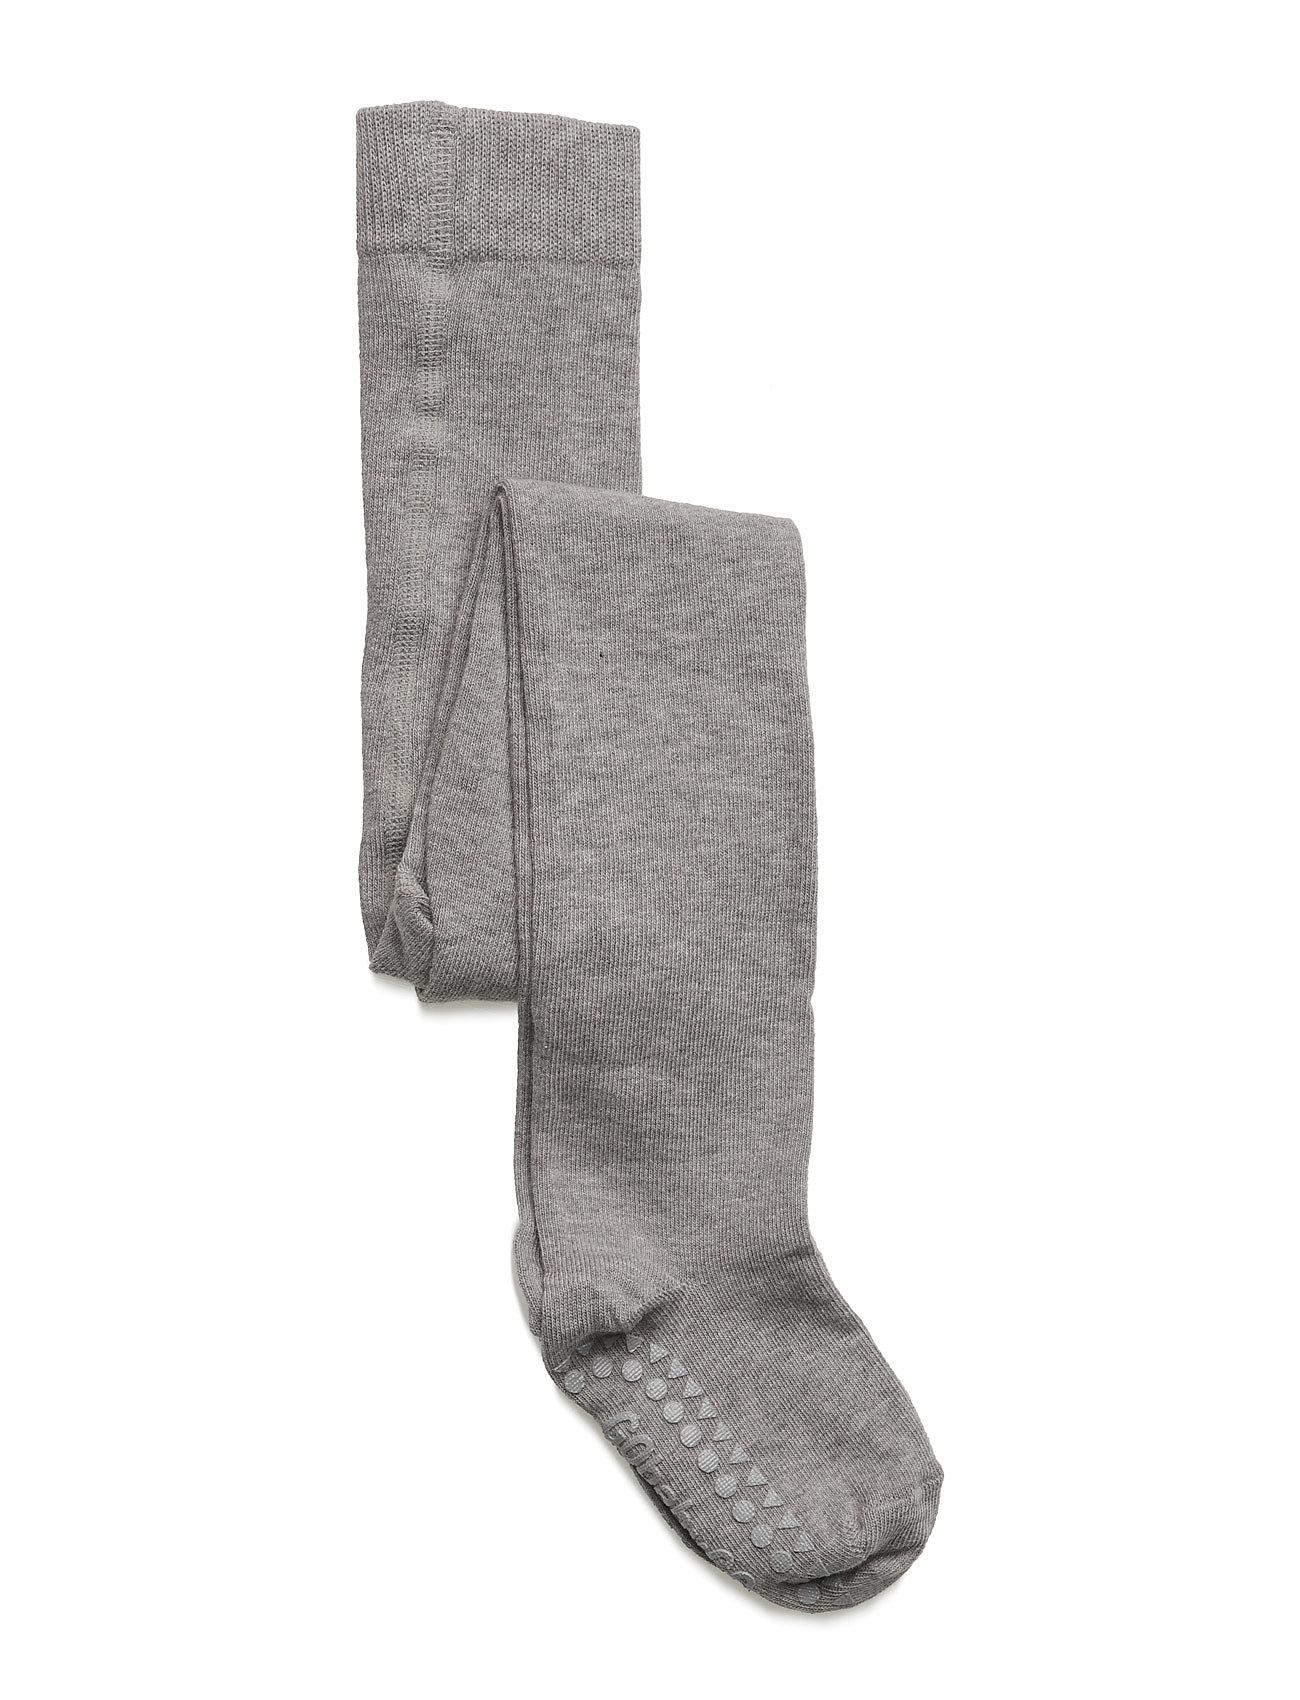 a6efc4a0 Non-slip Tights (Grey Melange) (£15) - GoBabyGo -   Boozt.com